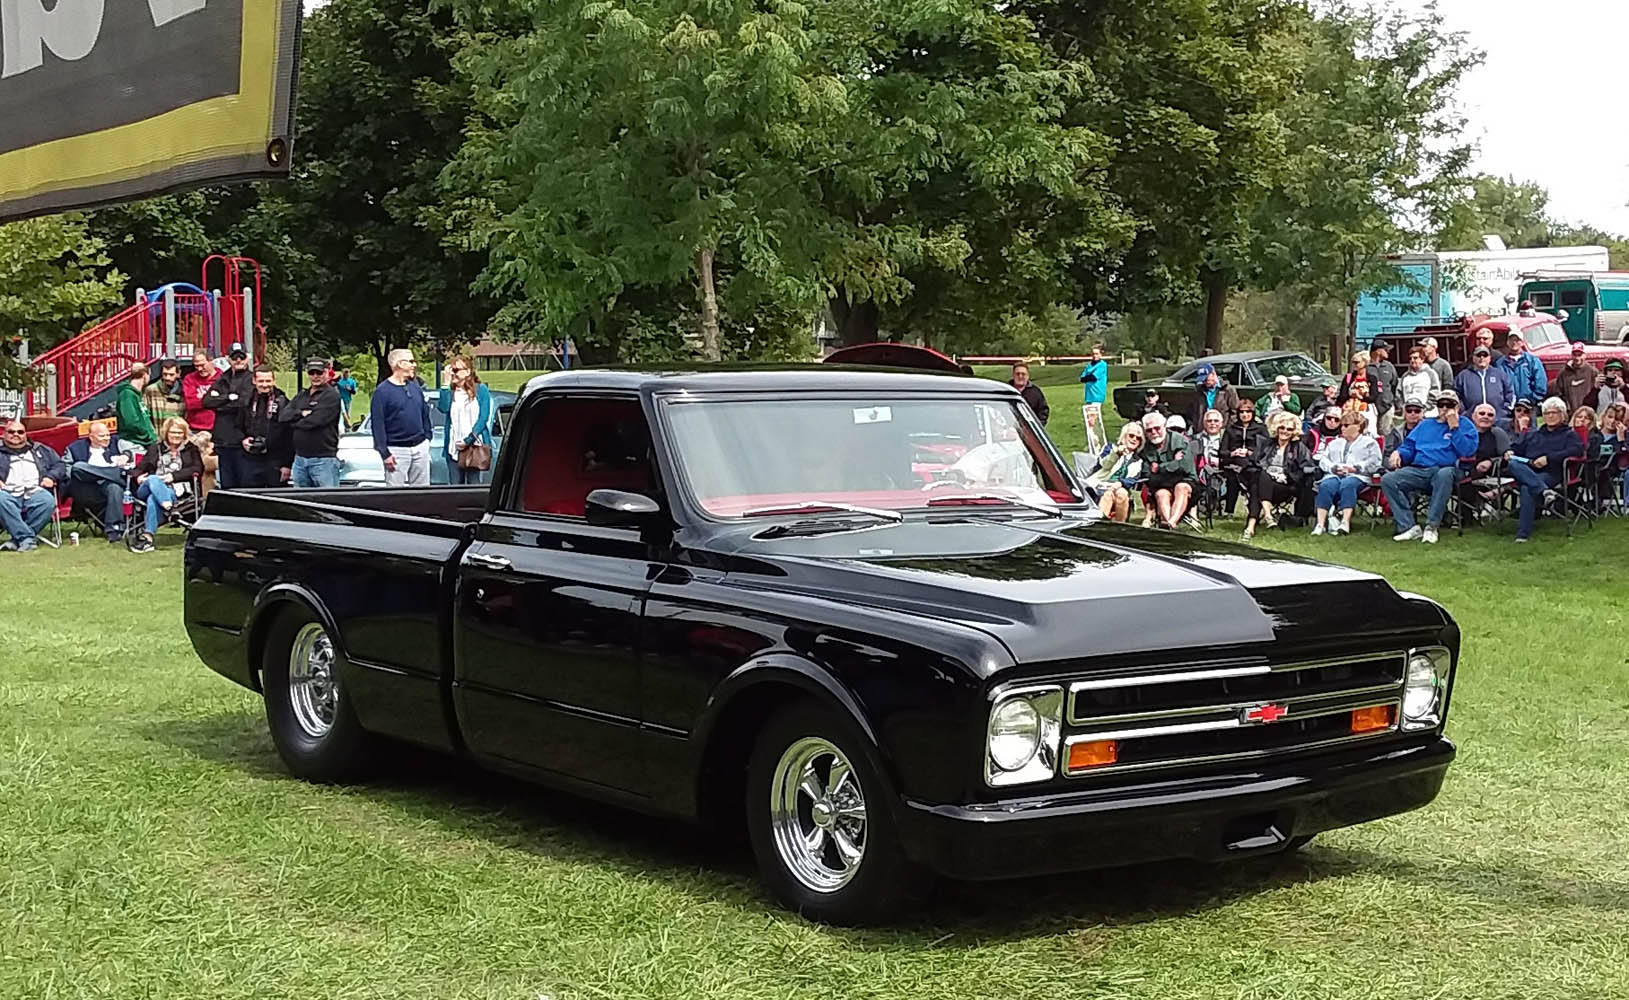 Specialty- 1967 C10 Pickup, Vinny Waites 1